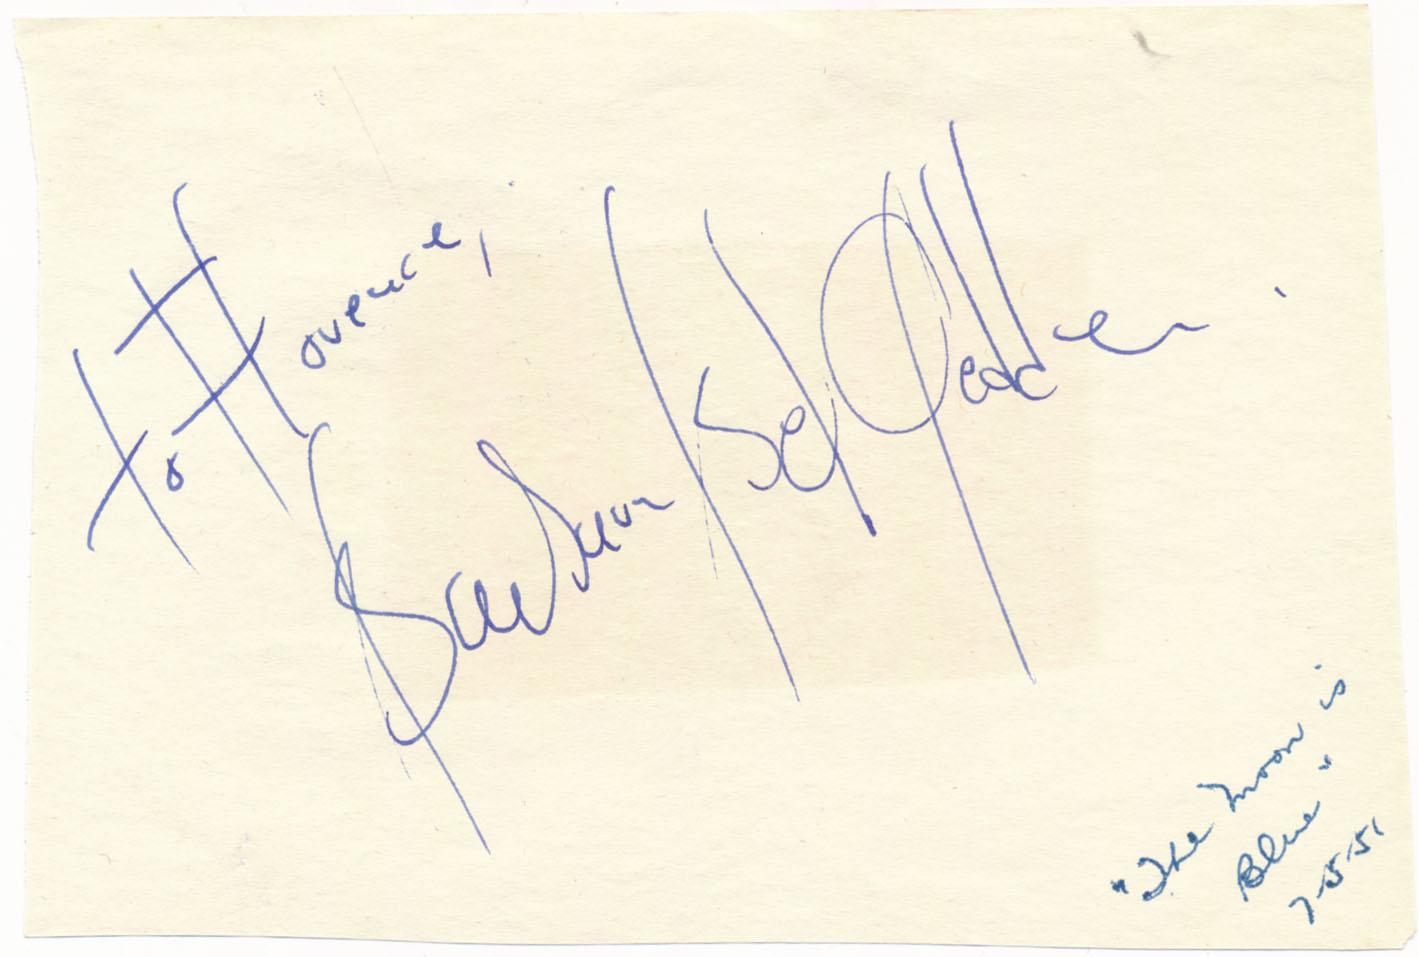 Lot #779  Album Page  Geddes, Barbara Bel (1951) (JSA LOAA) Cond: 9.5